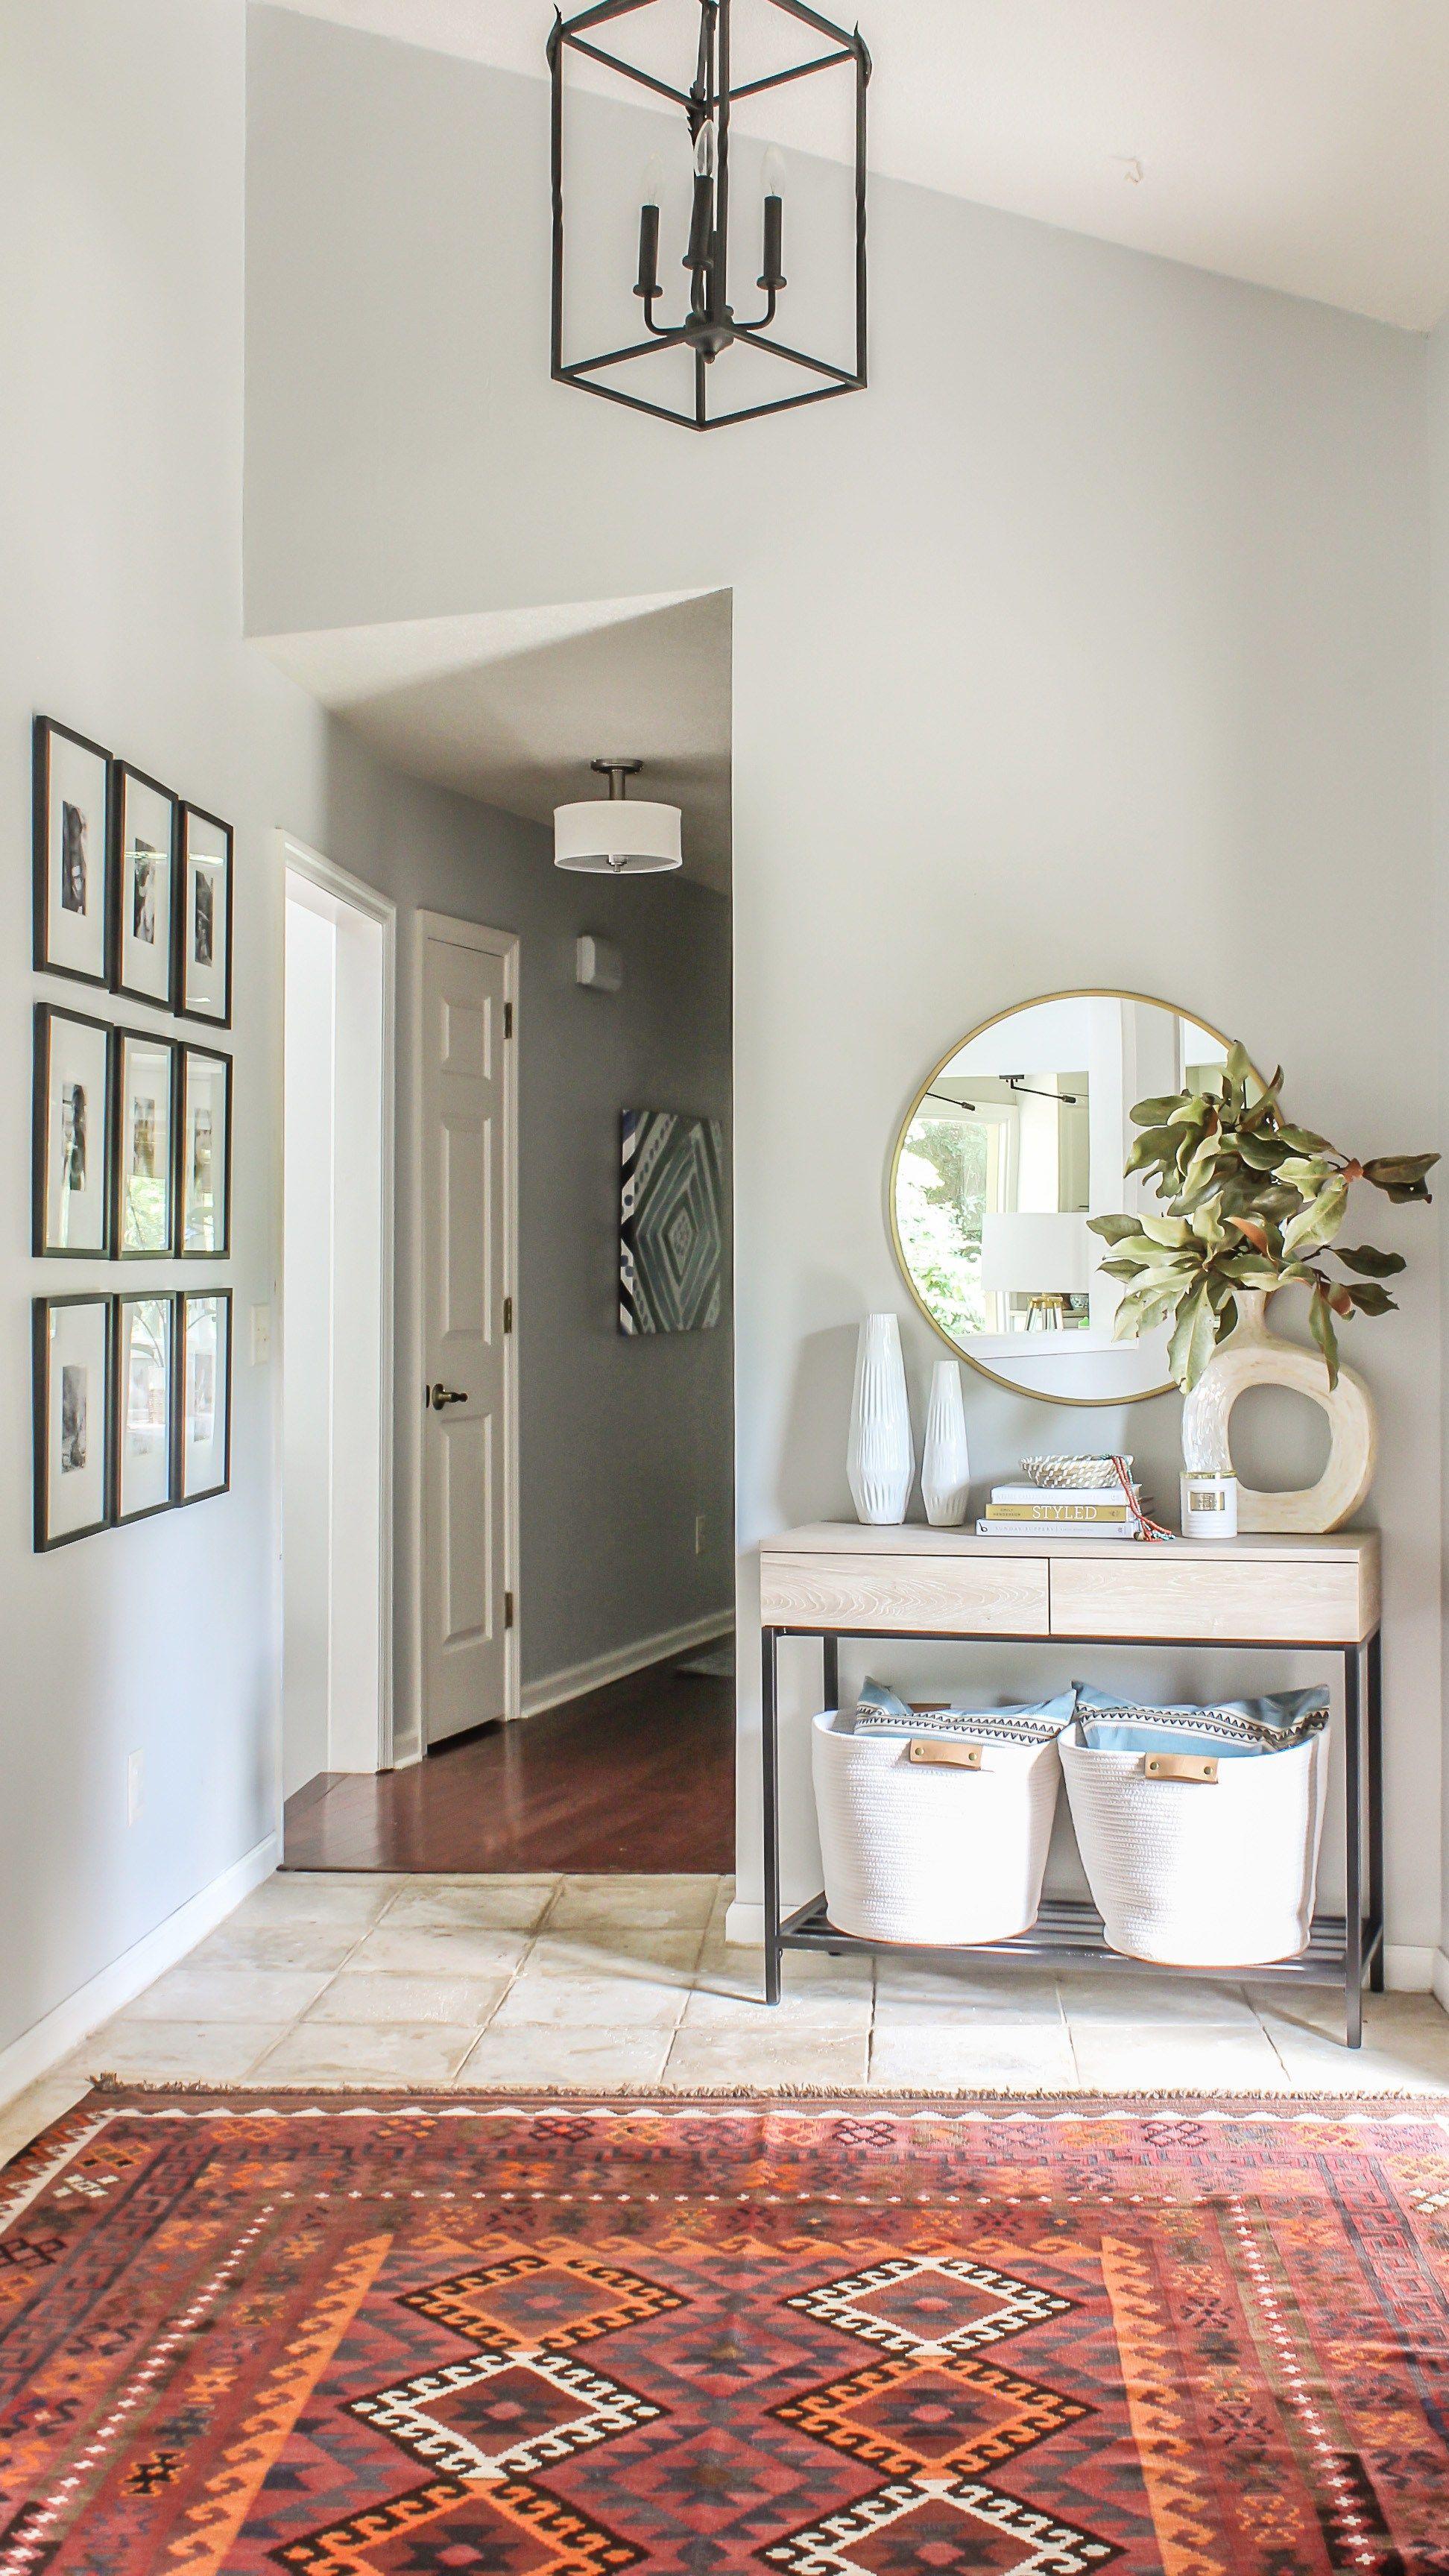 Modern Farmhouse Meets Boho Foyer Makeover Budget Friendly Decor Country House Decor Funky Home Decor Modern Foyer